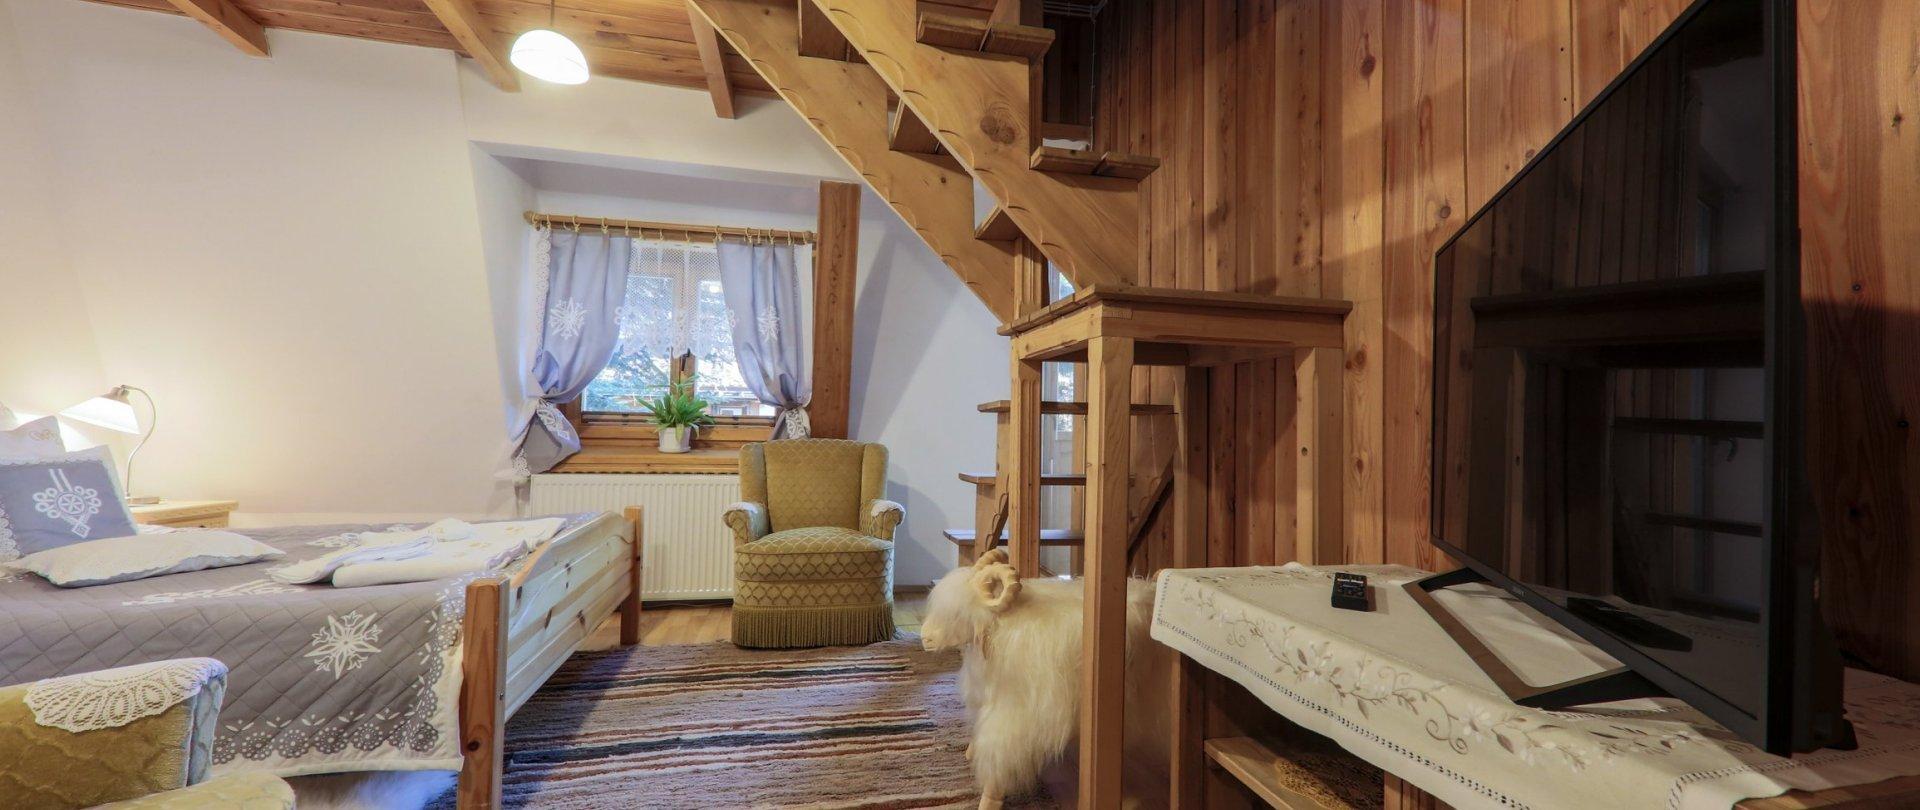 Izba 3 - Apartament Babci Zosi